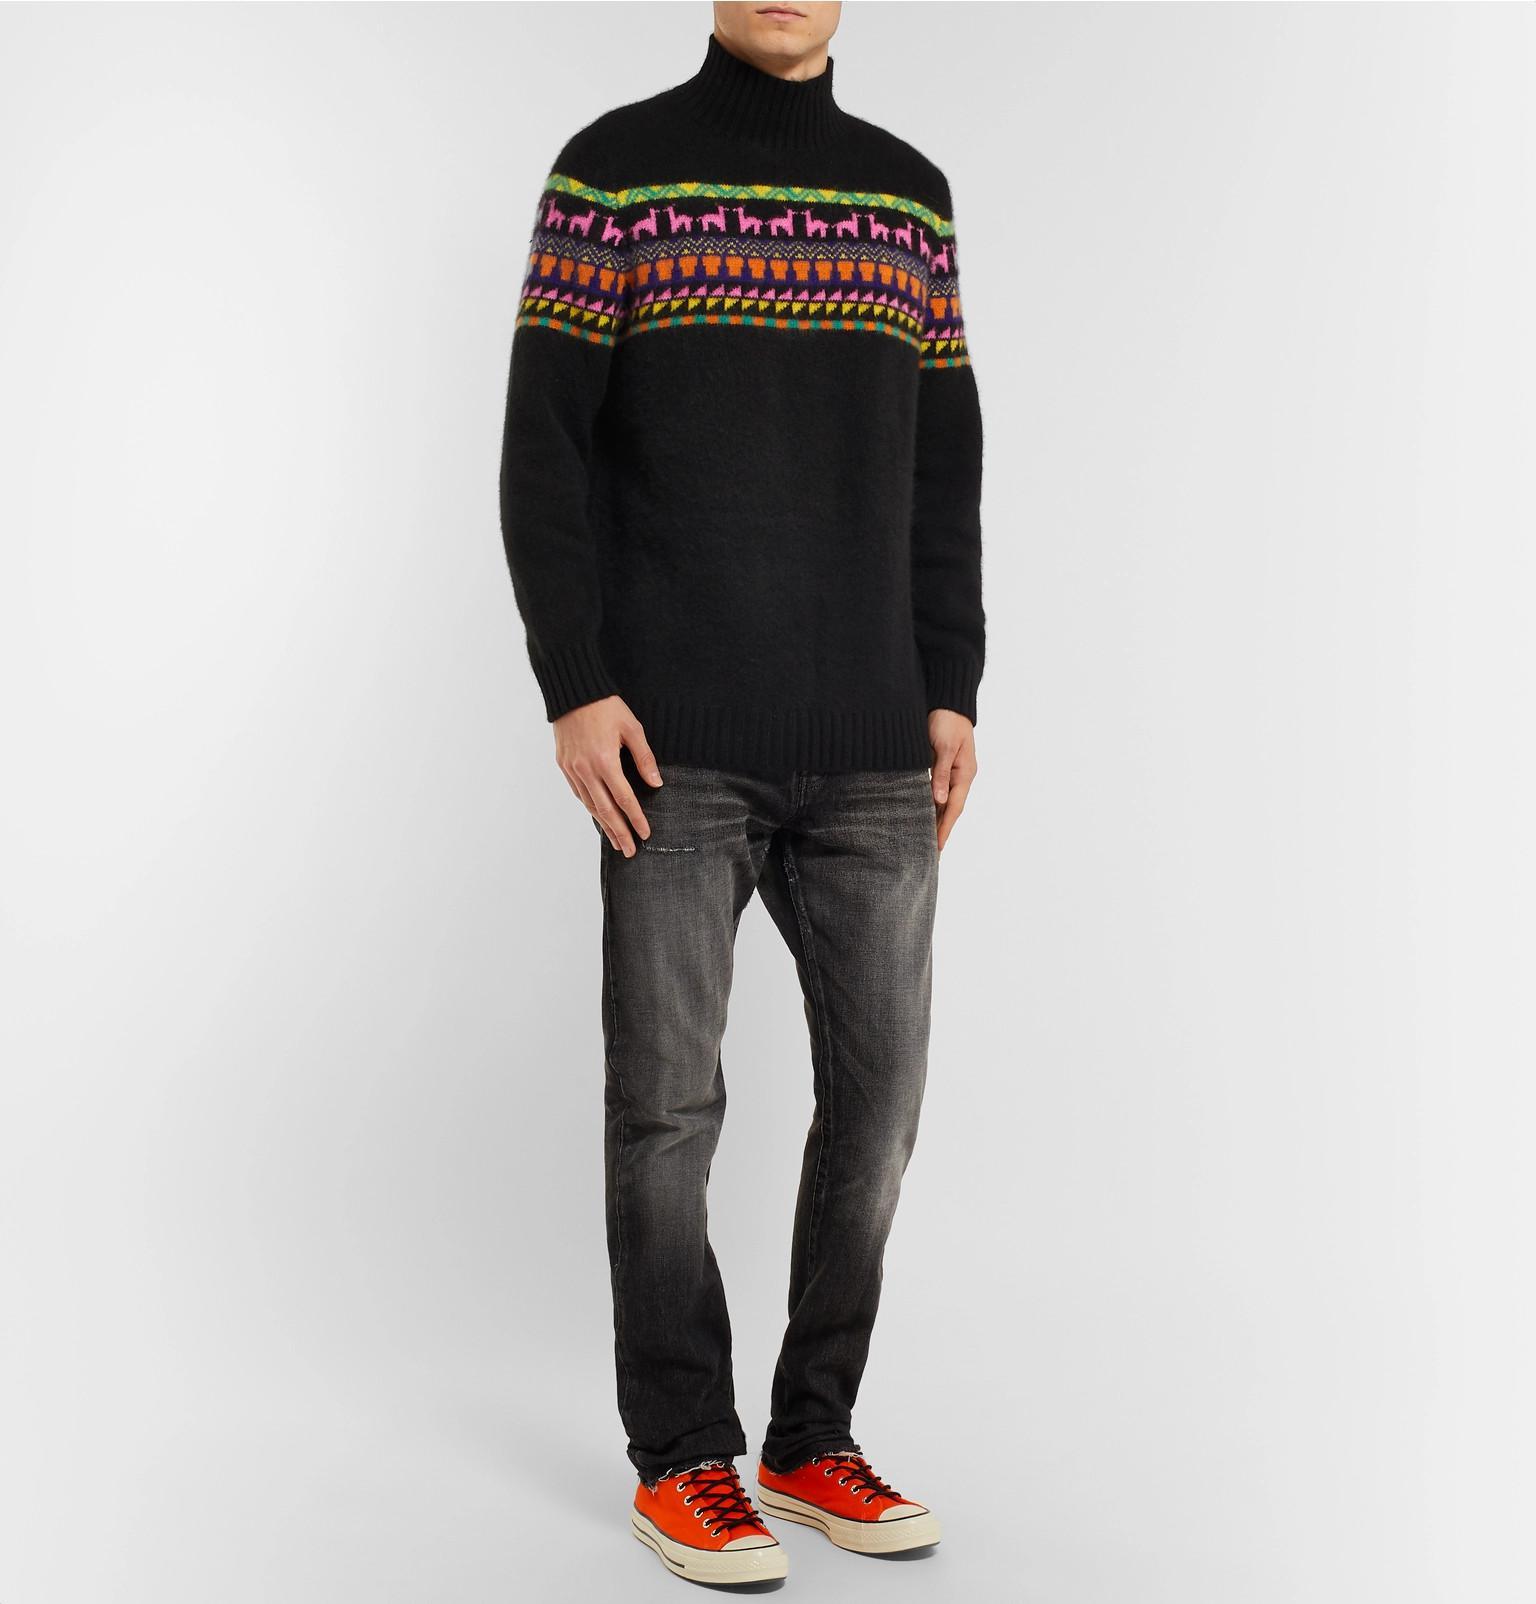 Elder Rollneck In Statesman The Sweater Intarsia Lyst Cashmere w5qRZaC